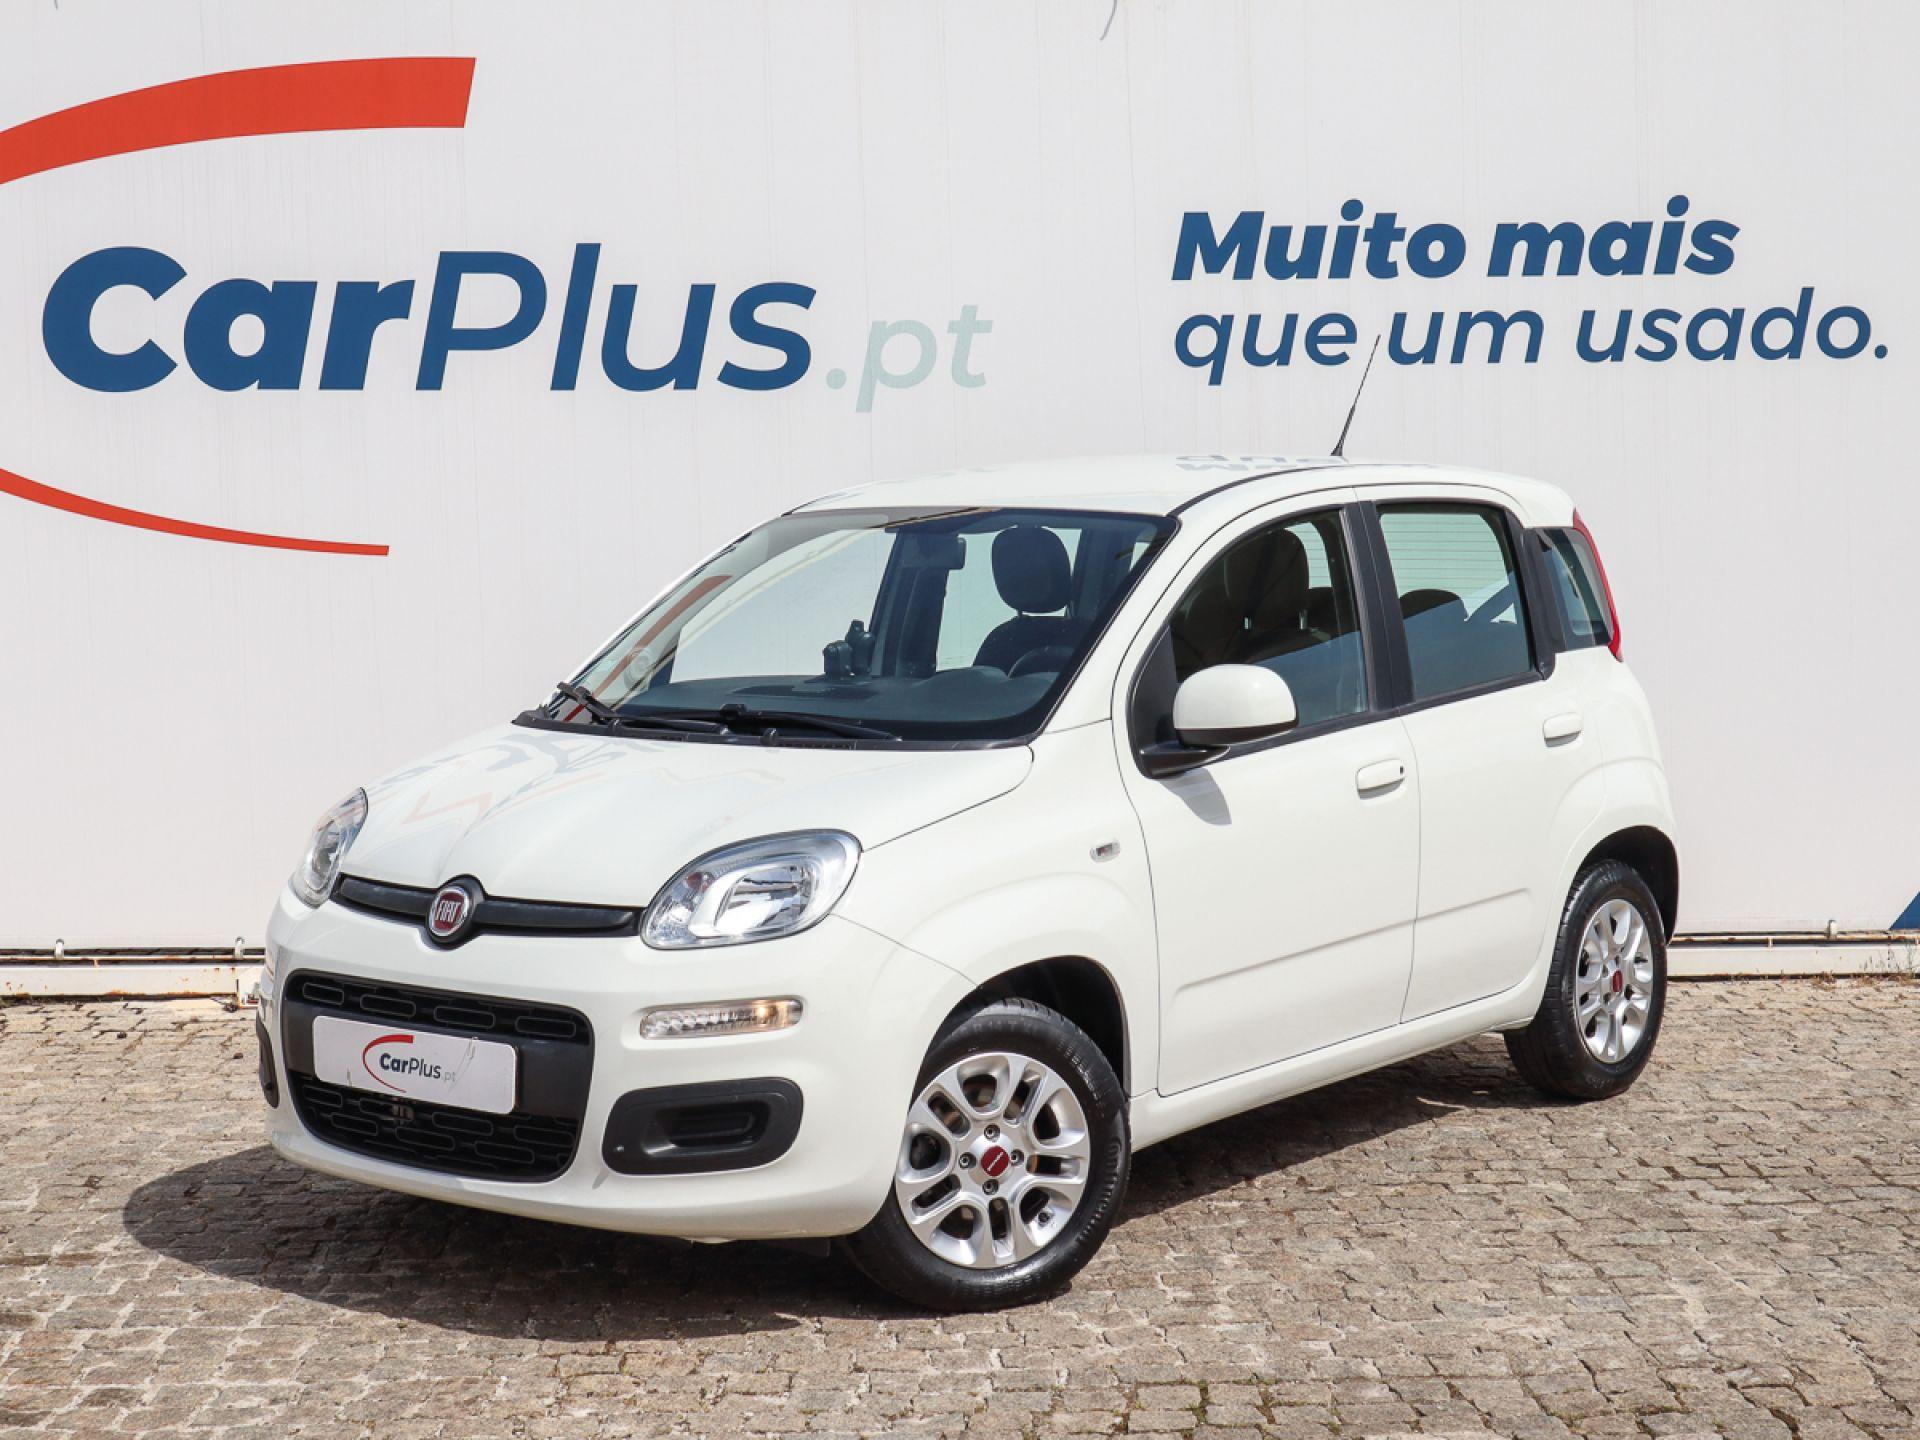 Fiat Panda 1.2 8v 69cv S&S Lounge JLL15 segunda mão Lisboa